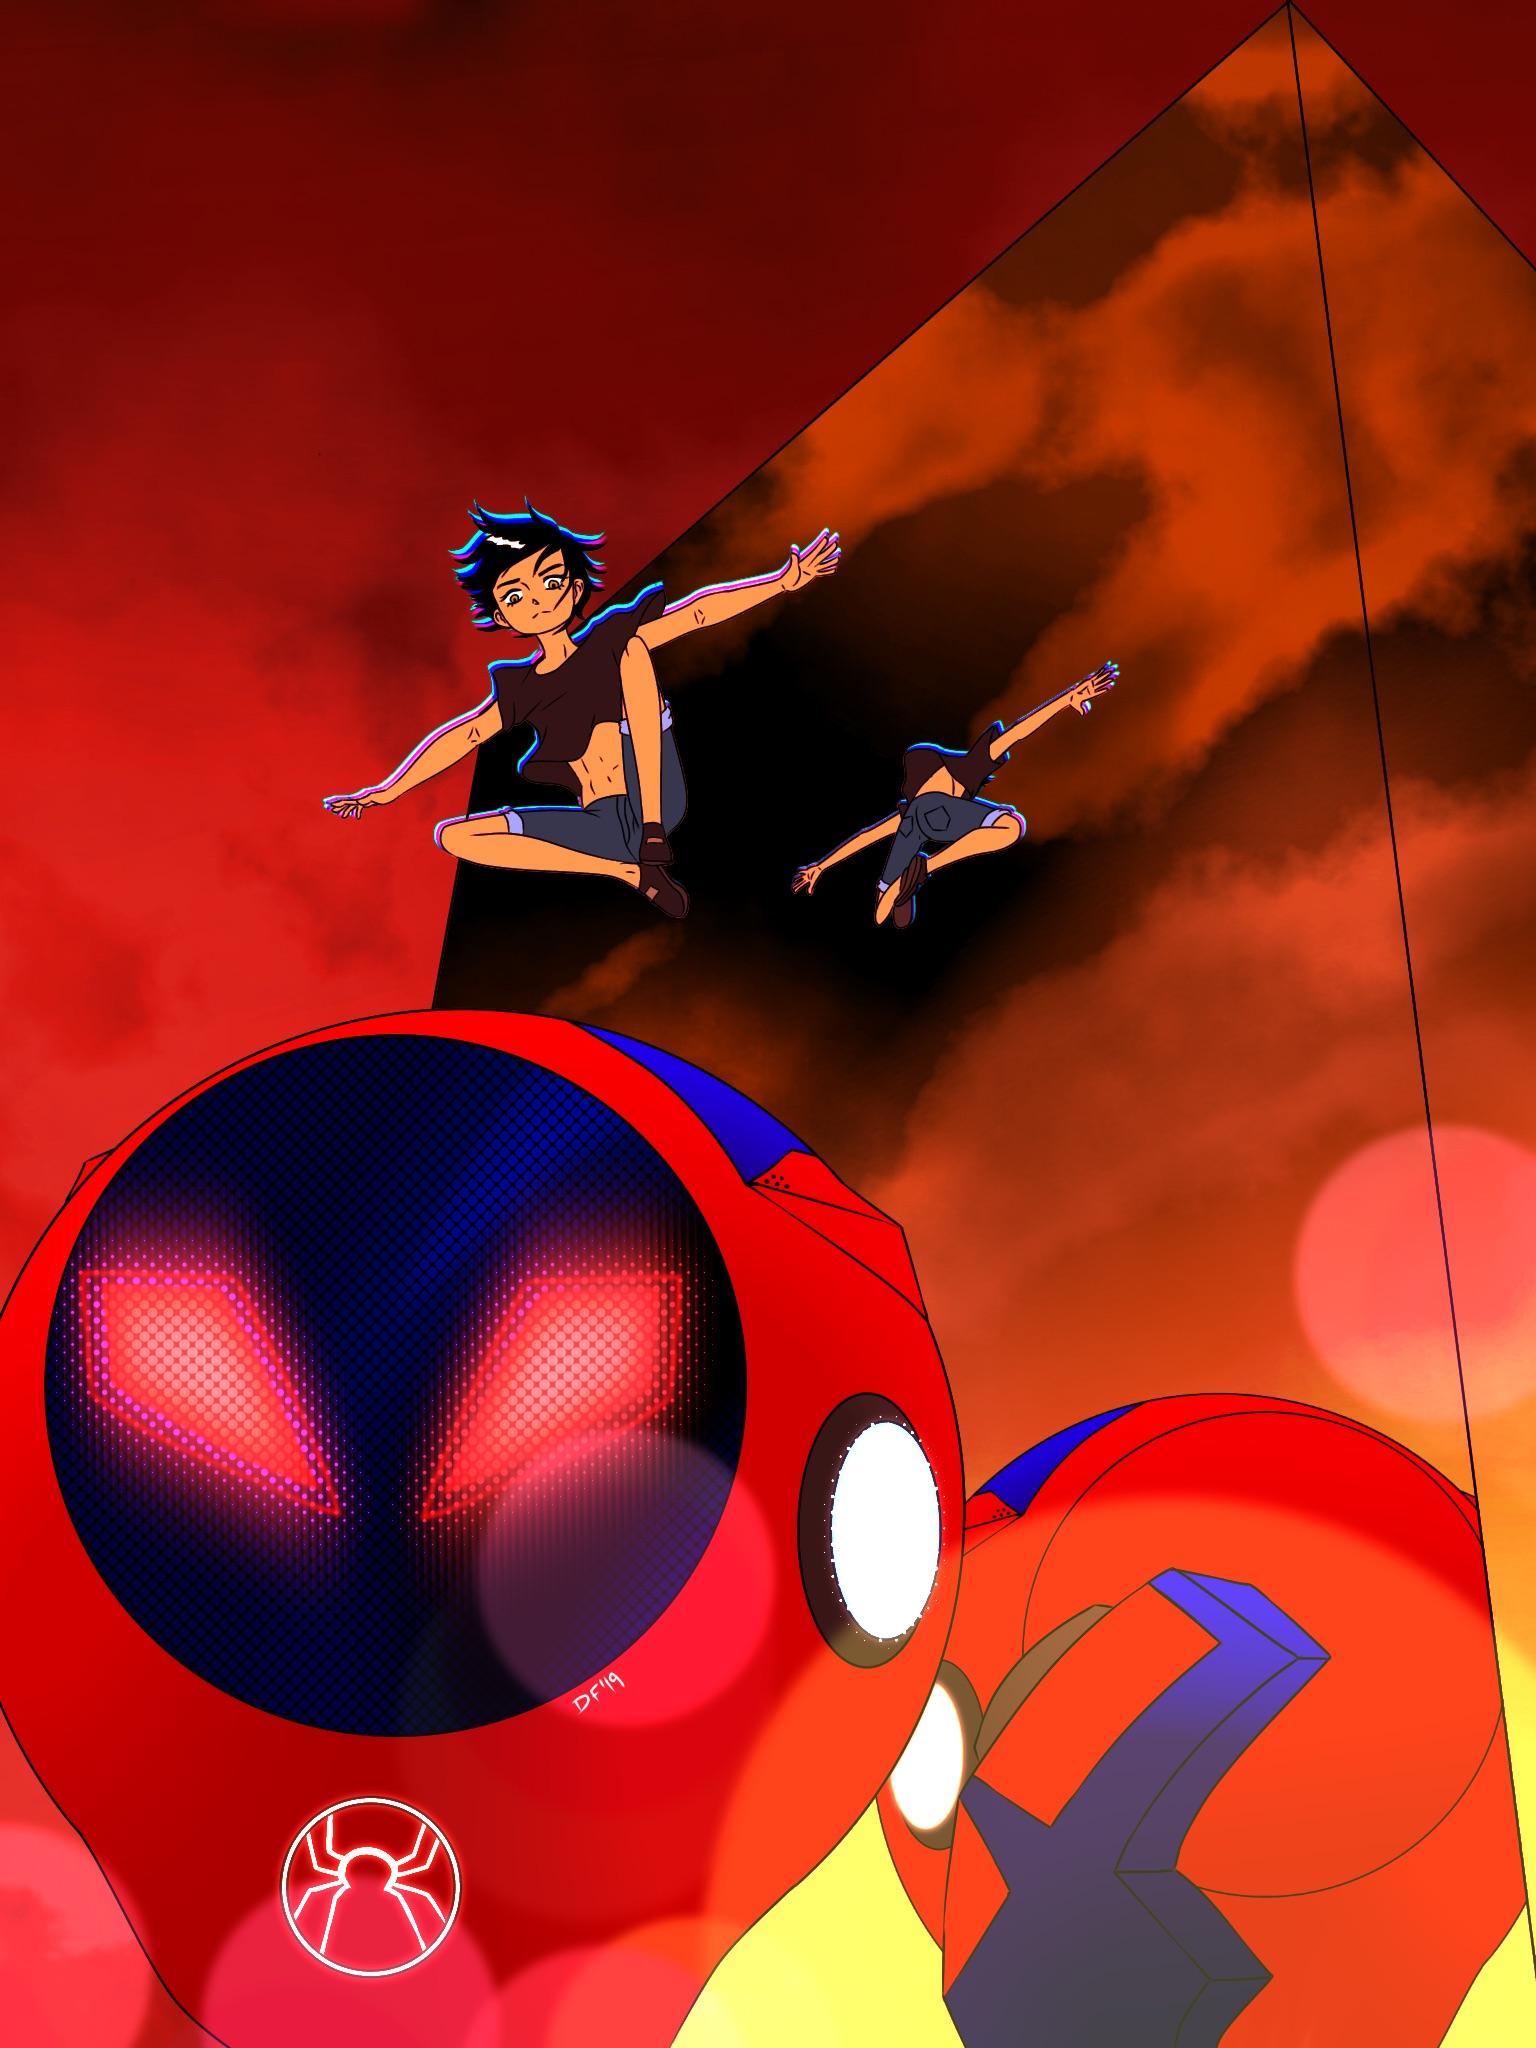 Peni Parker [Quite Some Time After Spider-Verse]